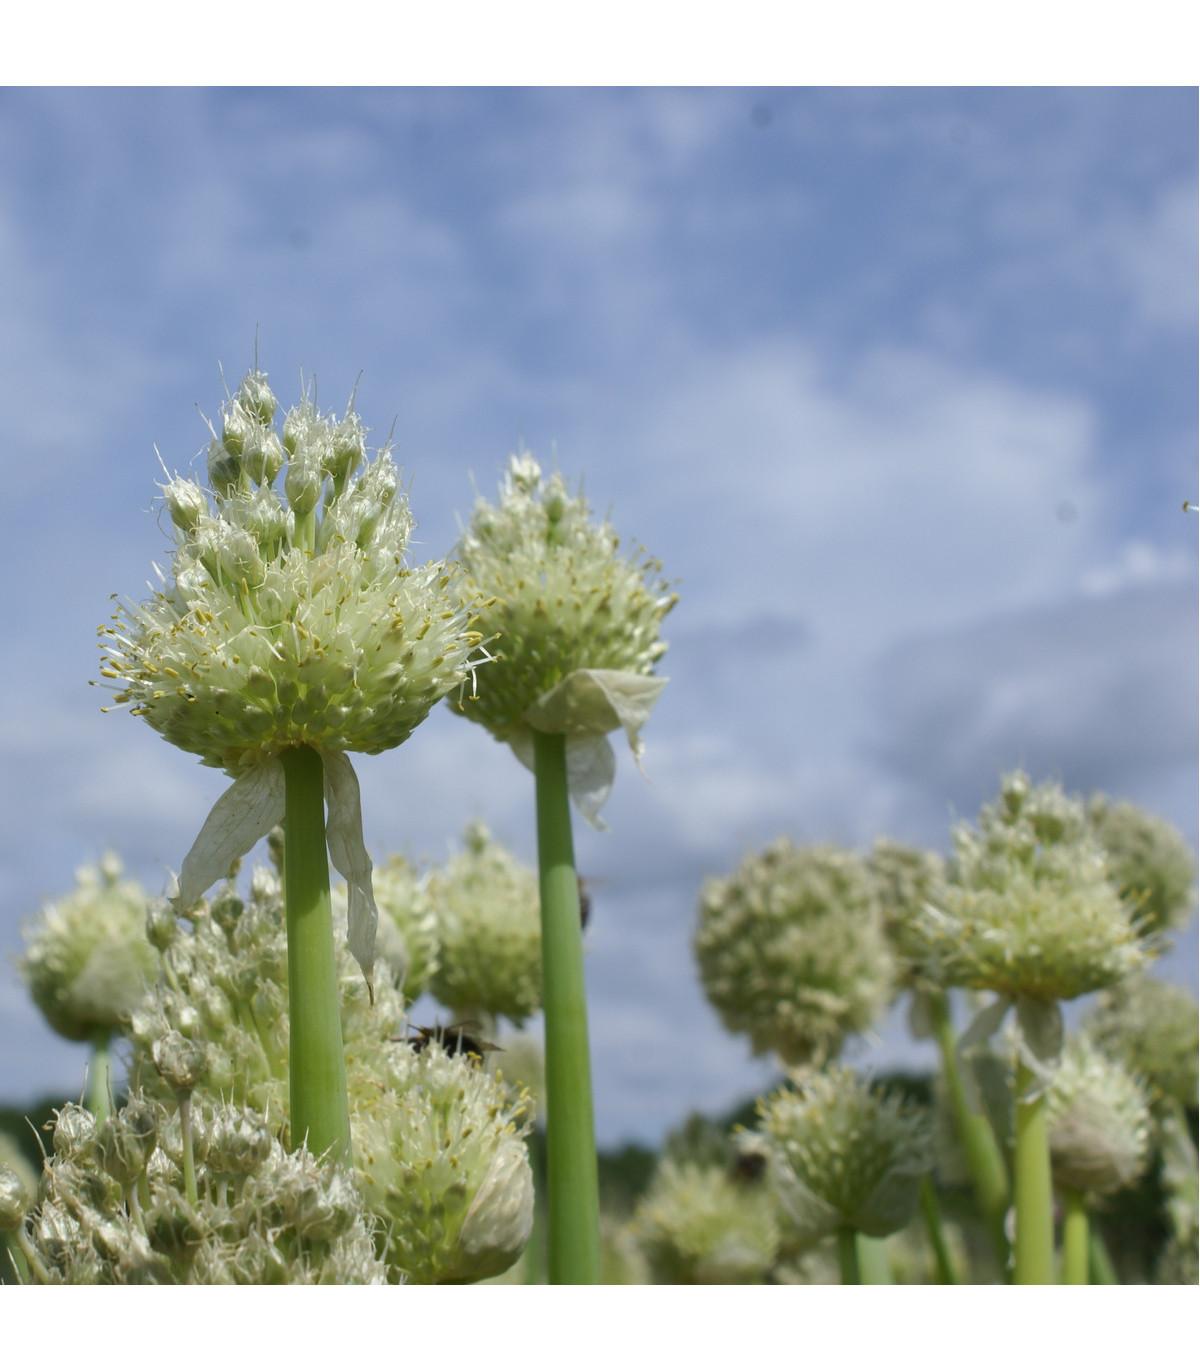 Cibule zimní - Česnek ošlejch - Allium fistulosum - semena - 120 ks